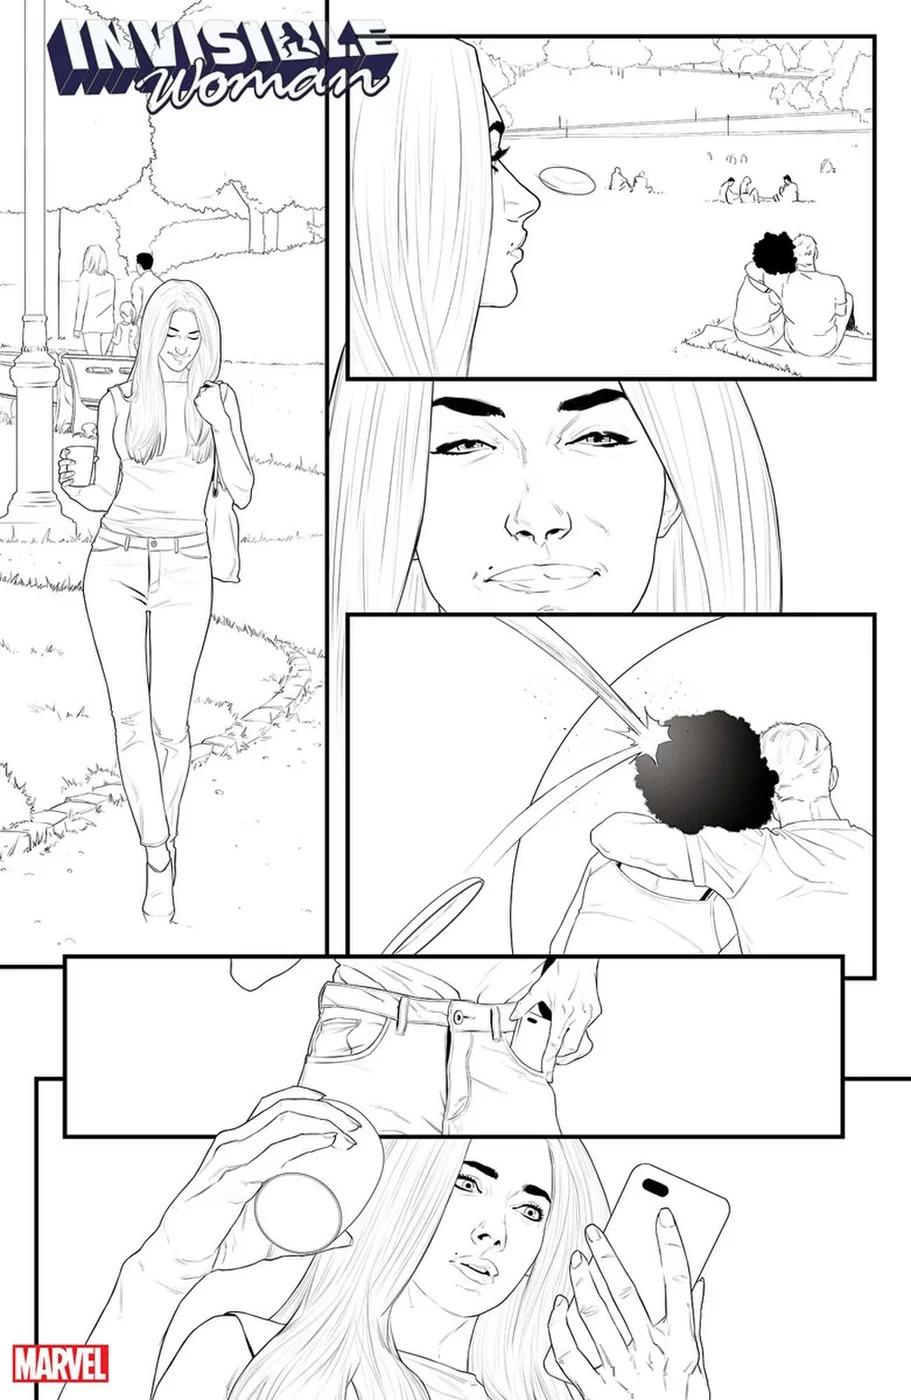 Invisible Woman #1, anteprima 01 (chine)